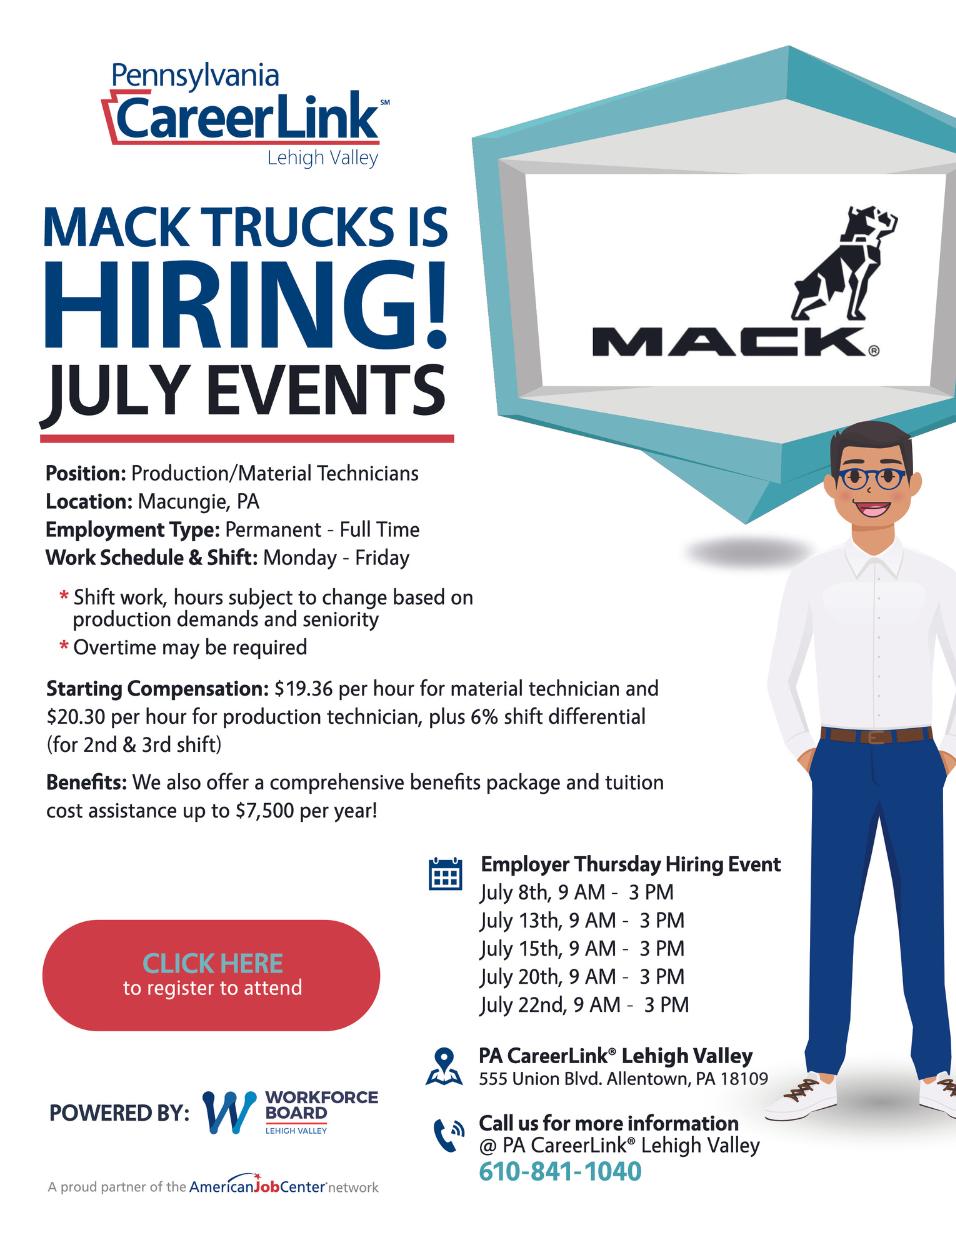 Mack Trucks is Hiring